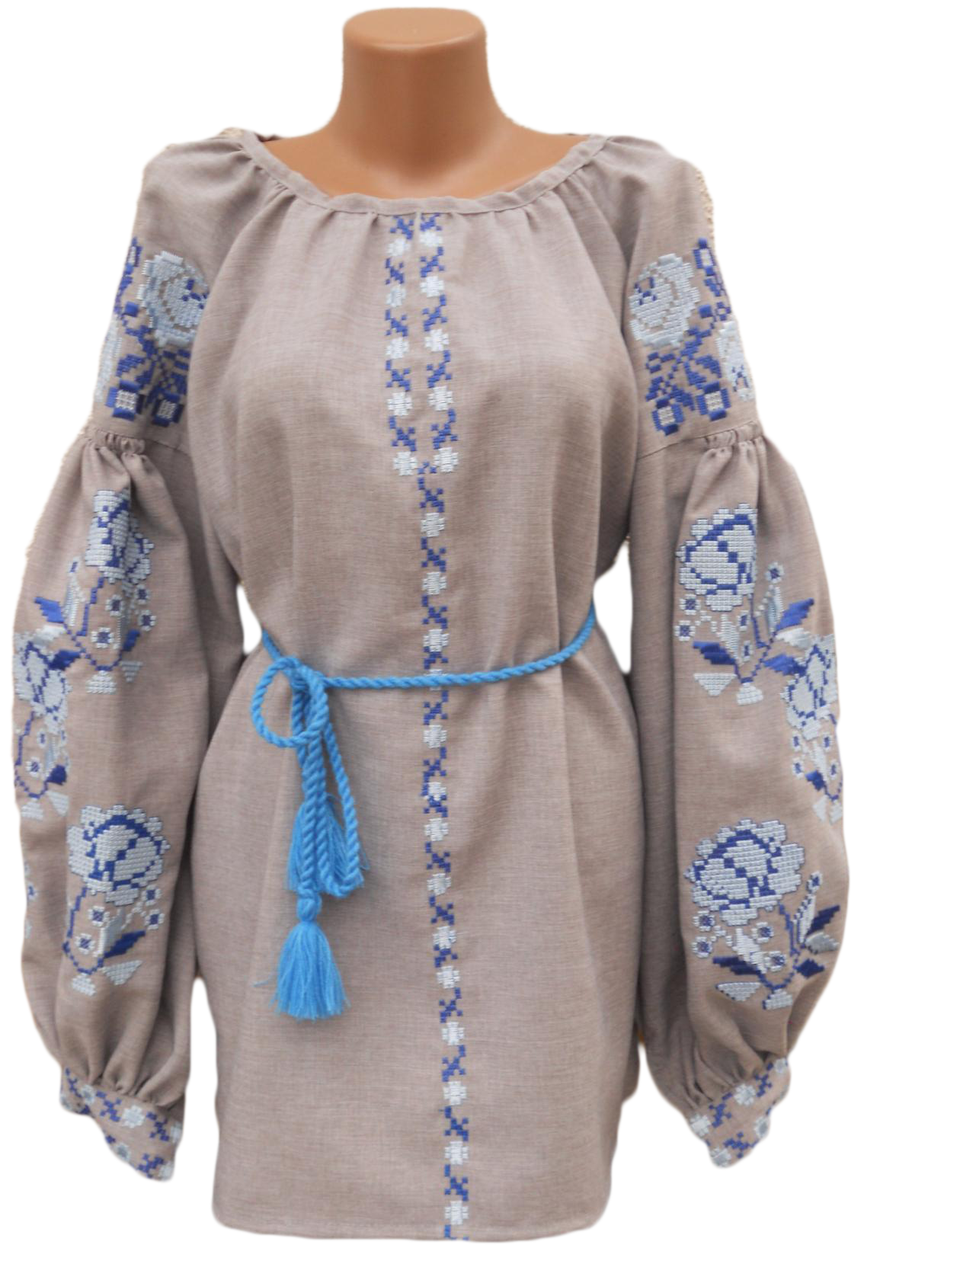 "Жіноча вишита сорочка (блузка) ""Нейталі"" (Женская вышитая рубашка (блузка) ""Нейтали"") BN-0081"